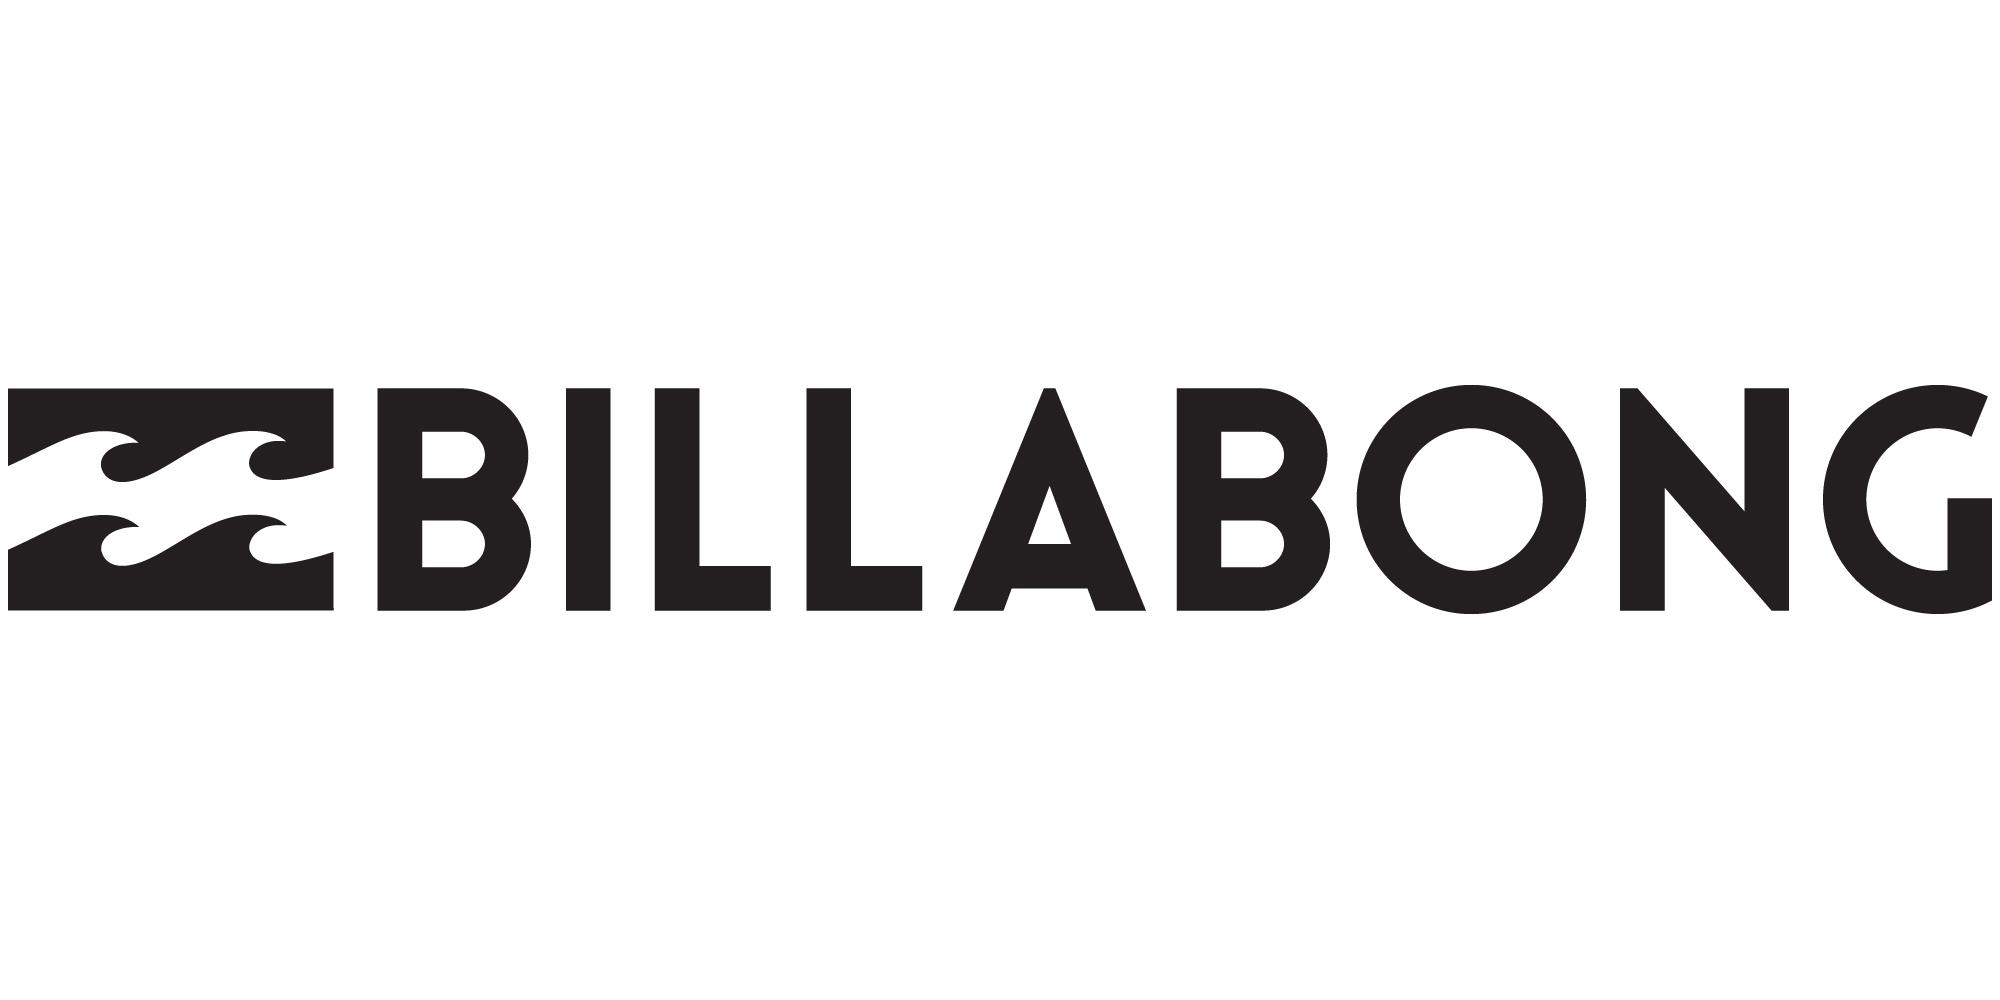 Billabong Surf logo